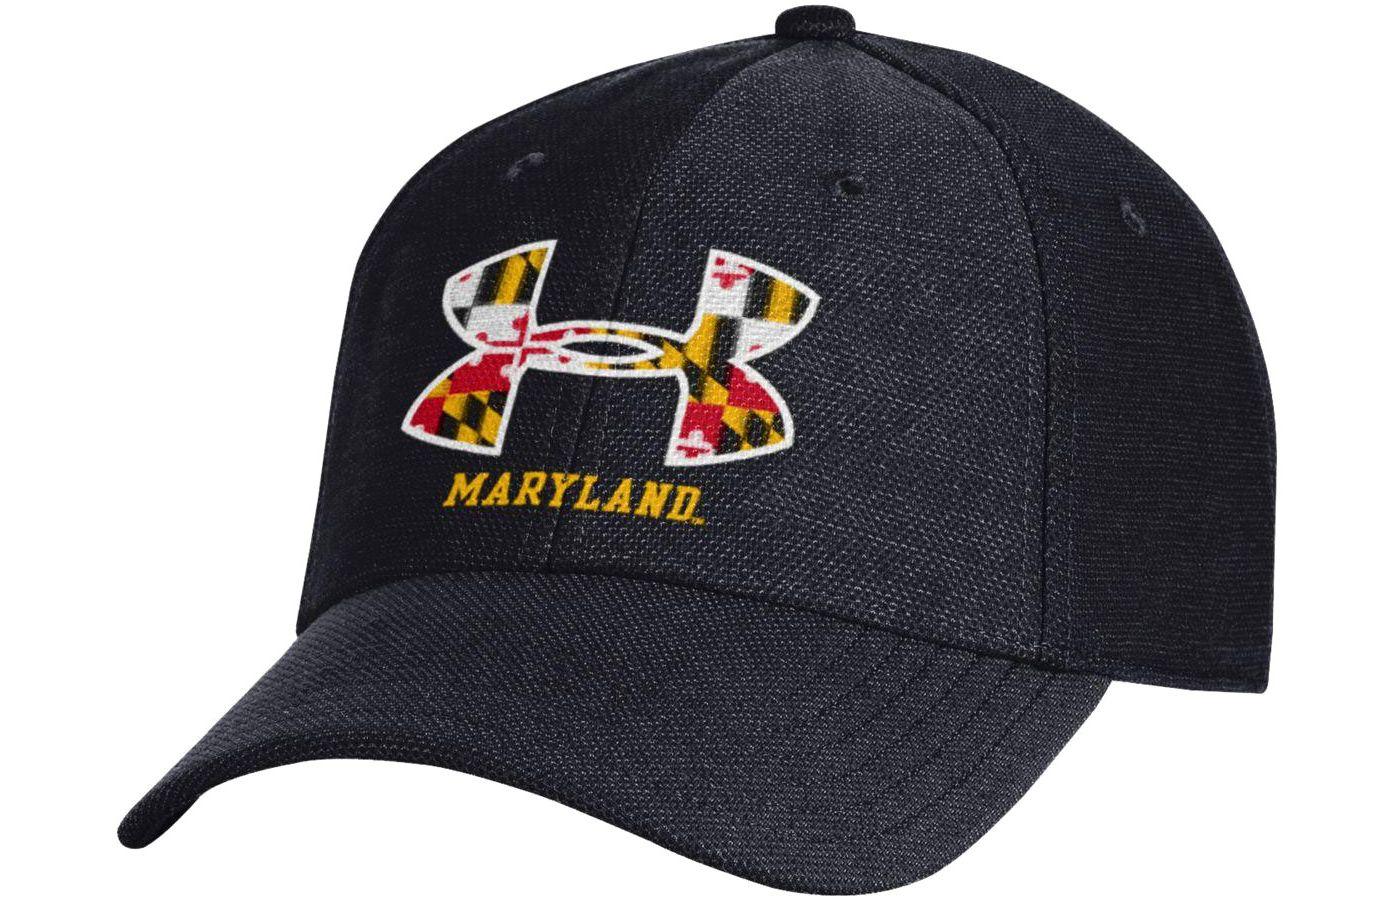 Under Armour Men's Maryland Terrapins 'Maryland Pride' Black Hat